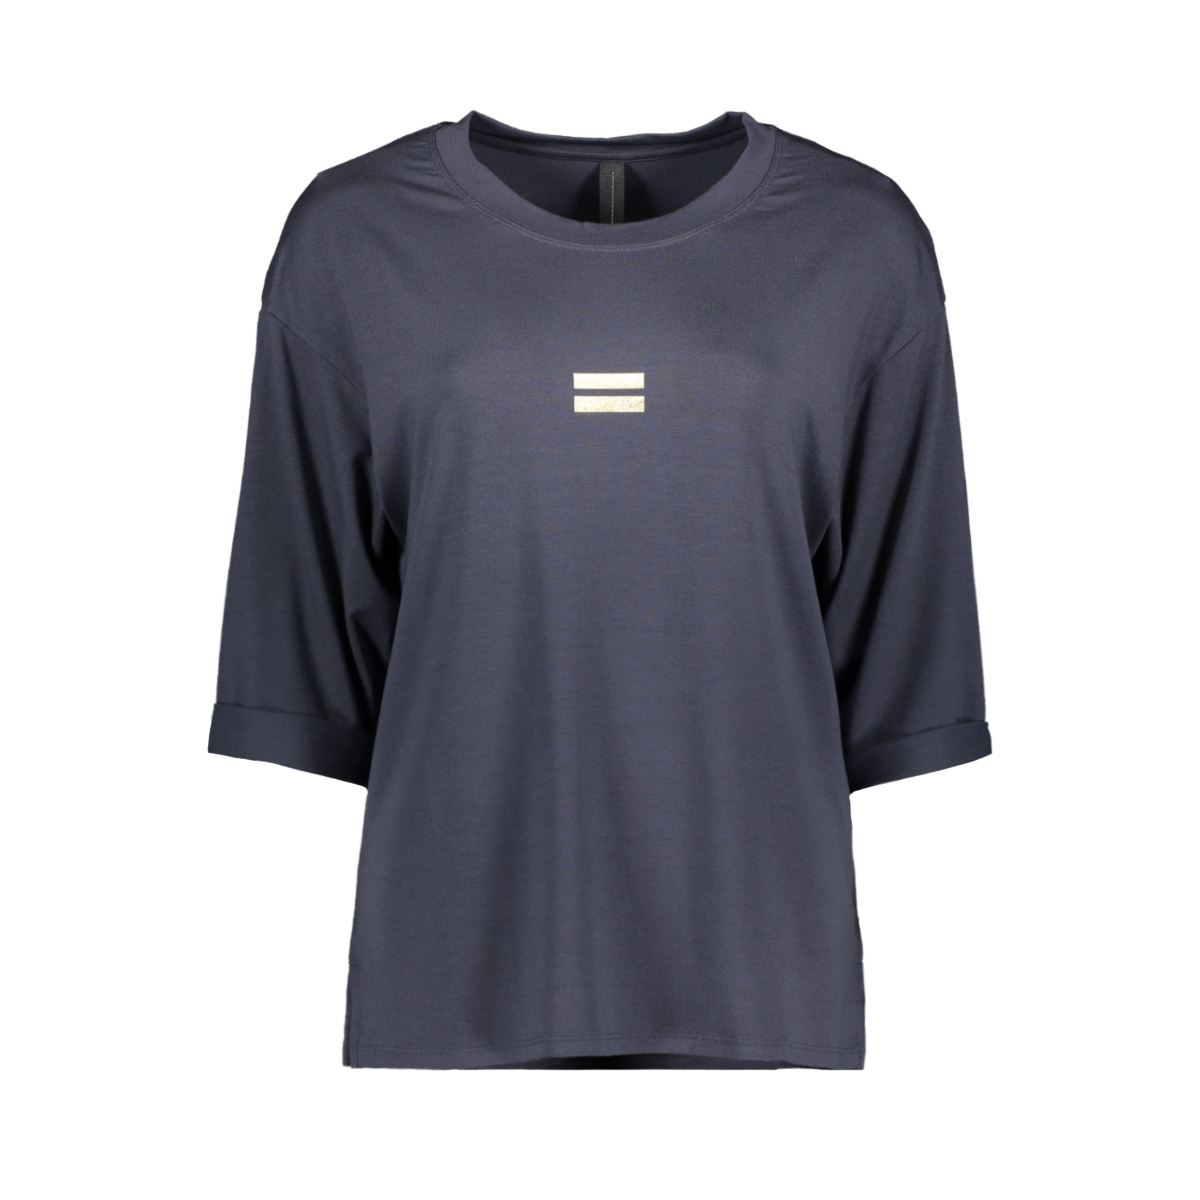 short sleeve tee 20 748 0202 10 days t-shirt dark grey blue